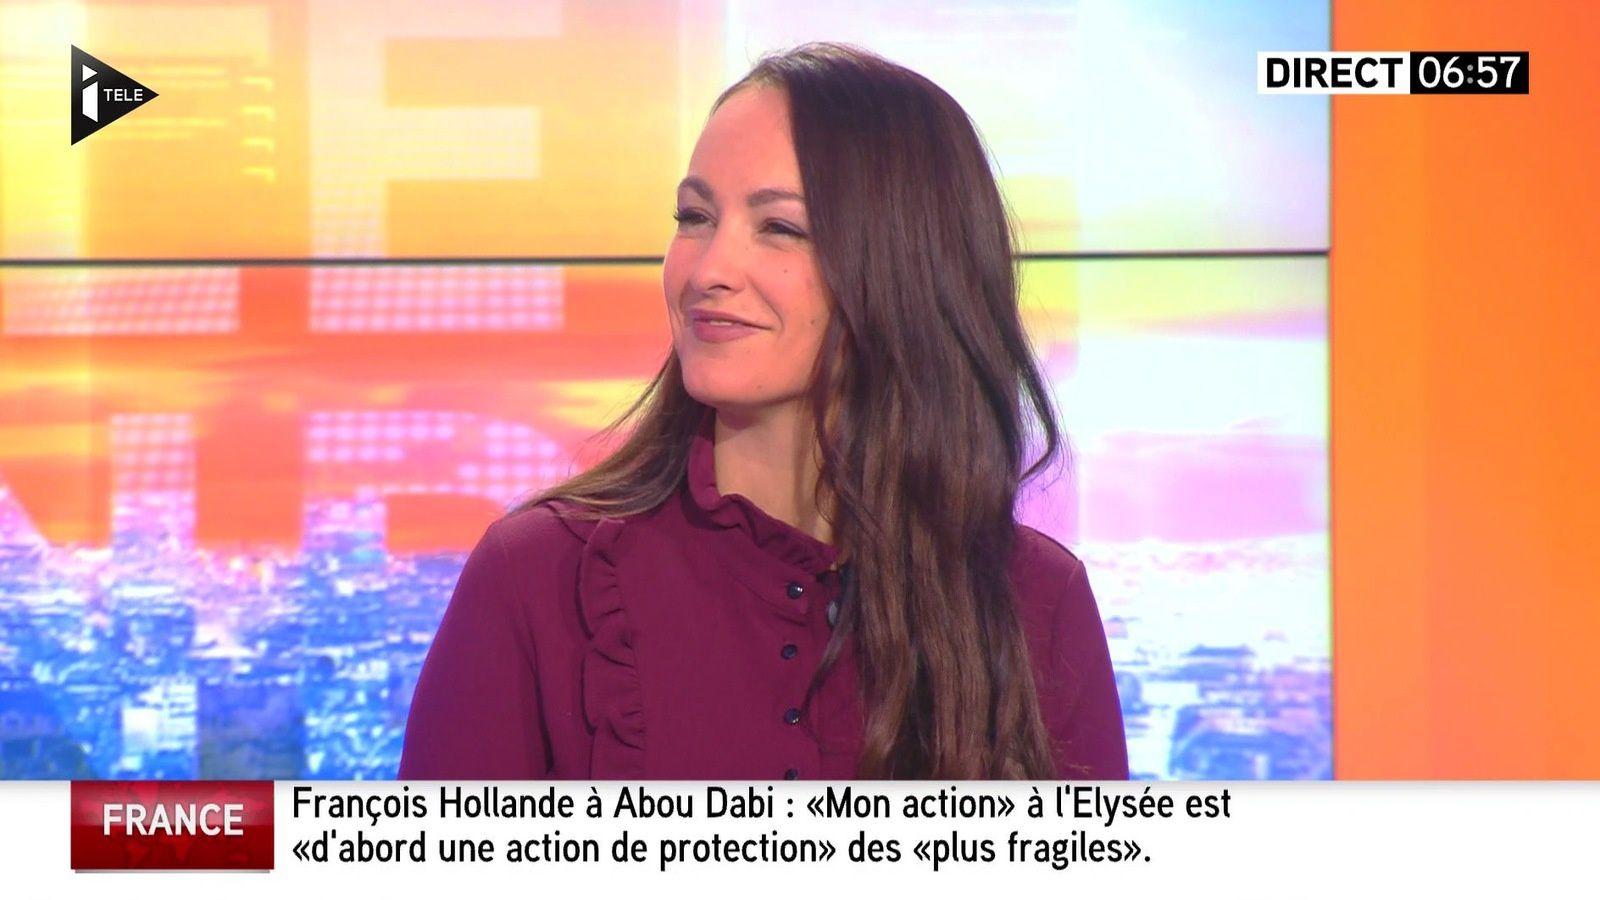 📸 ALEXANDRA BLANC @LCMAlexandra @alexandrablanc3 aujourd'hui pour LA METEO @itele #vuesalatele